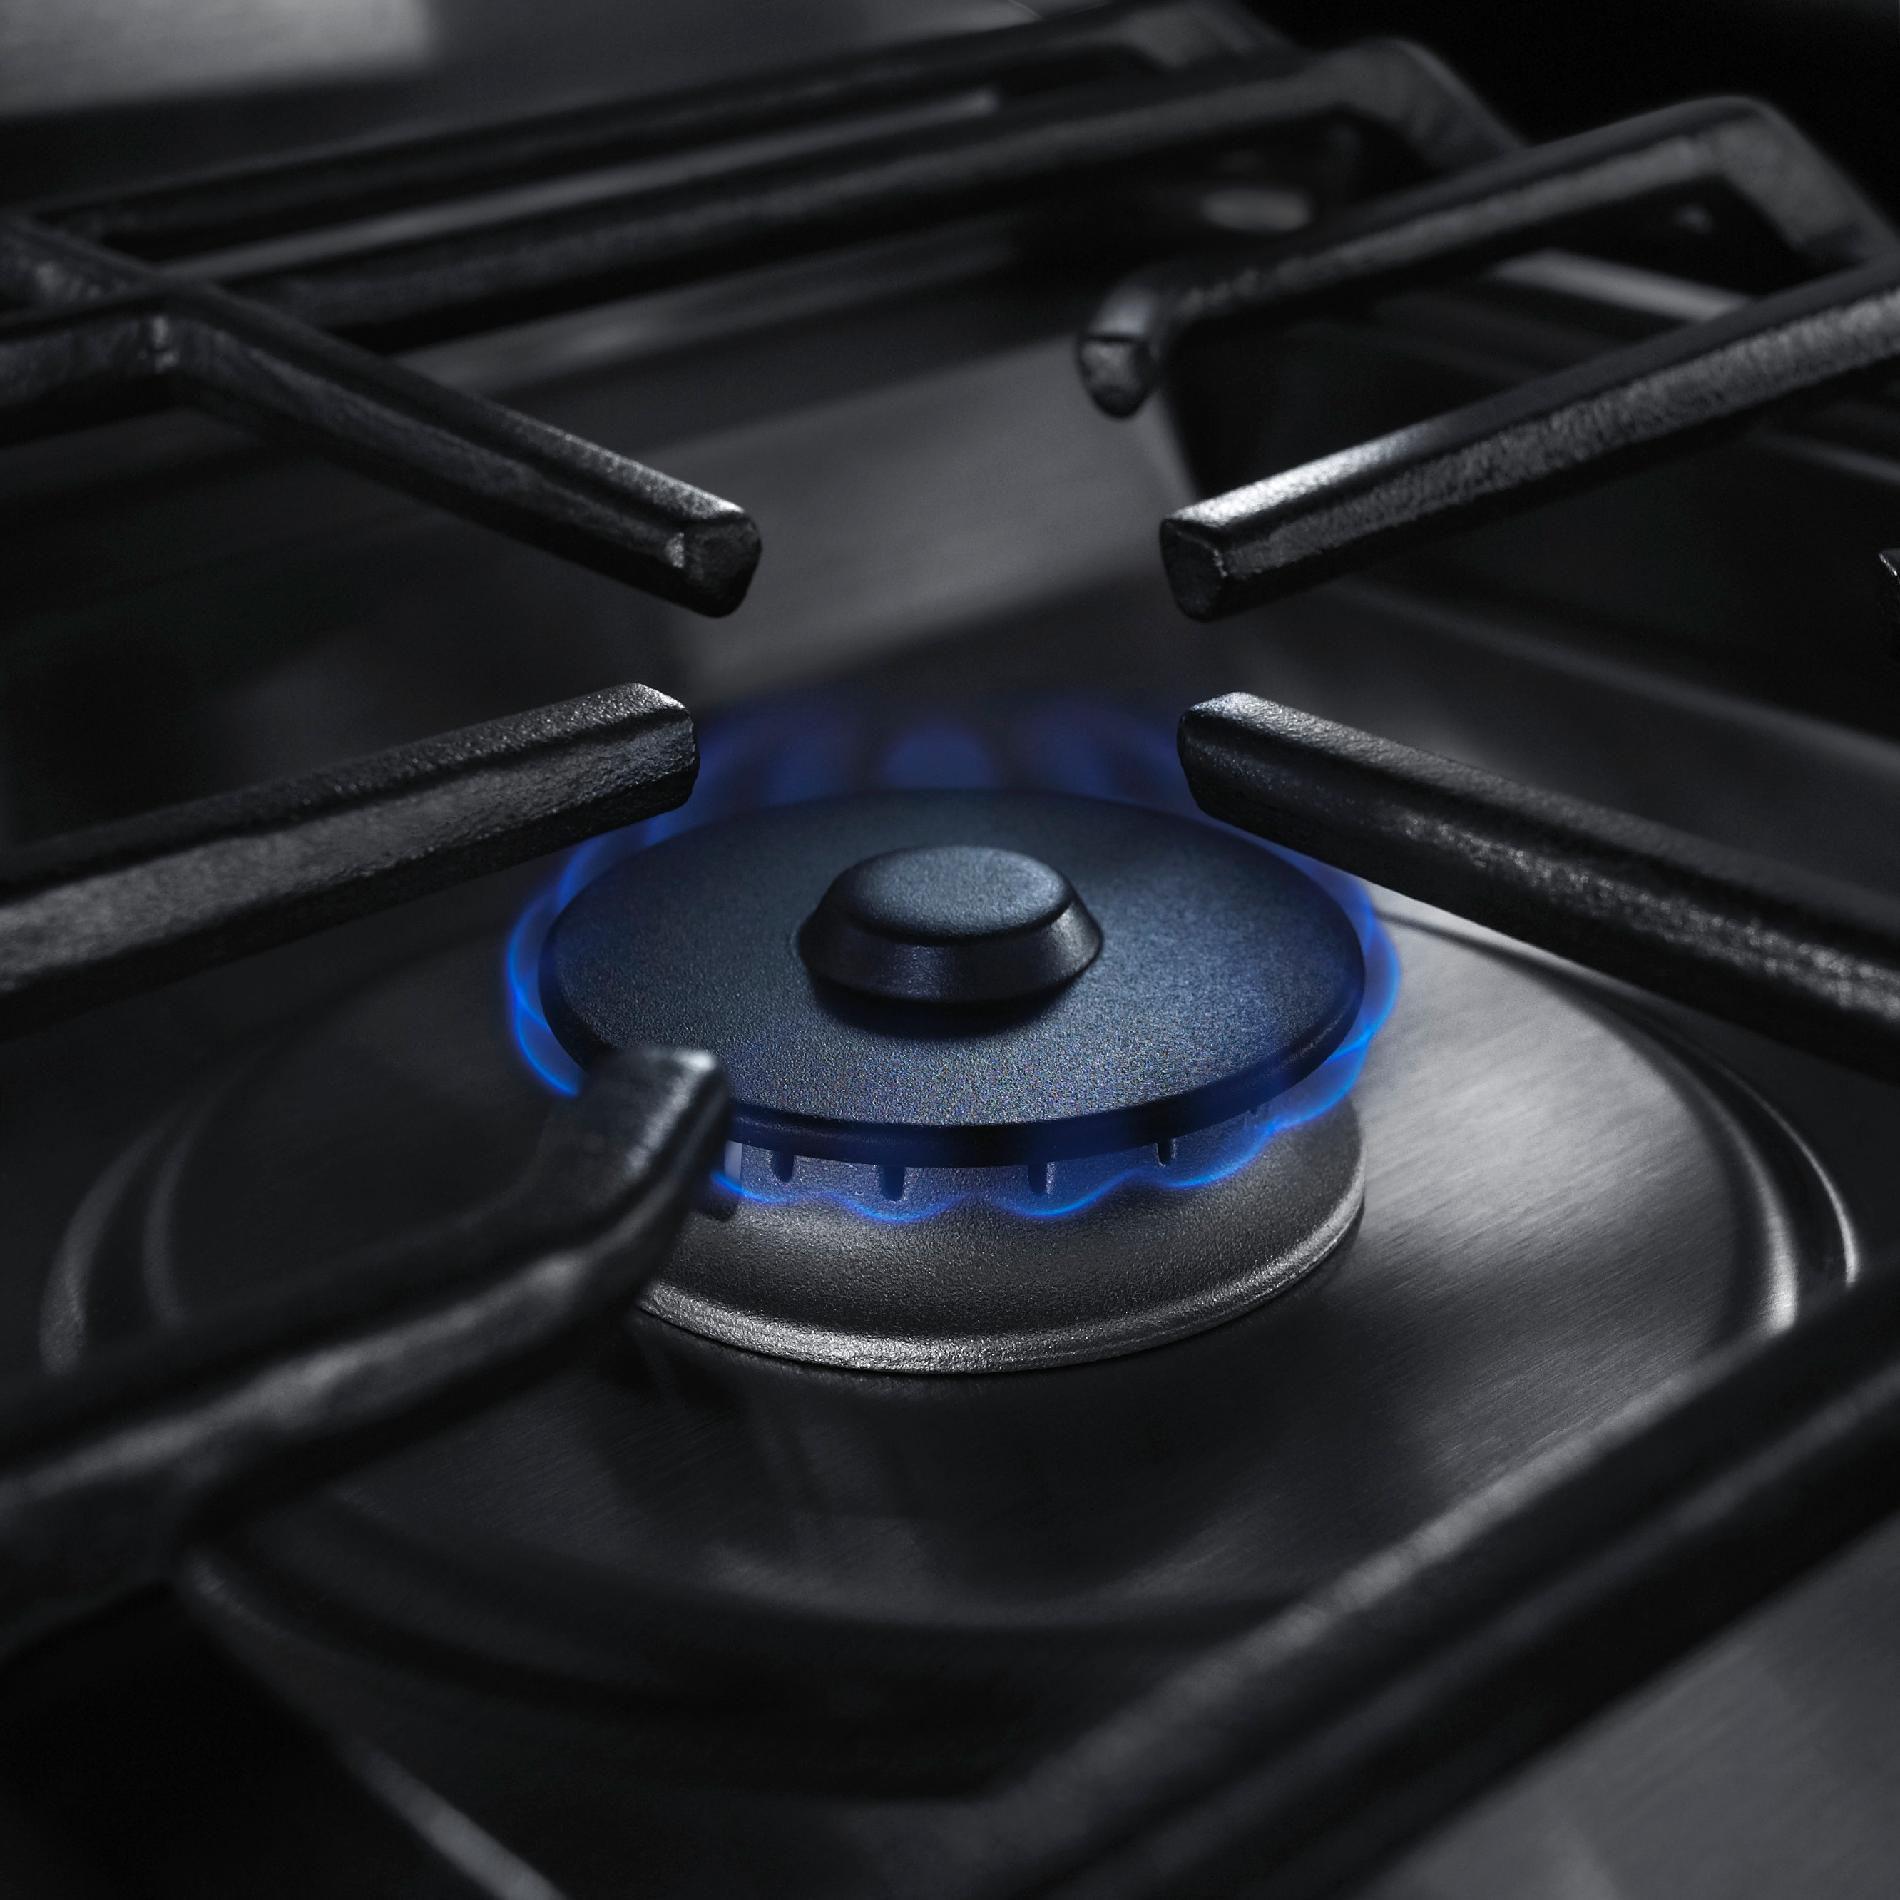 KitchenAid 5.8 cu. ft. Freestanding Stainless Steel Gas Range